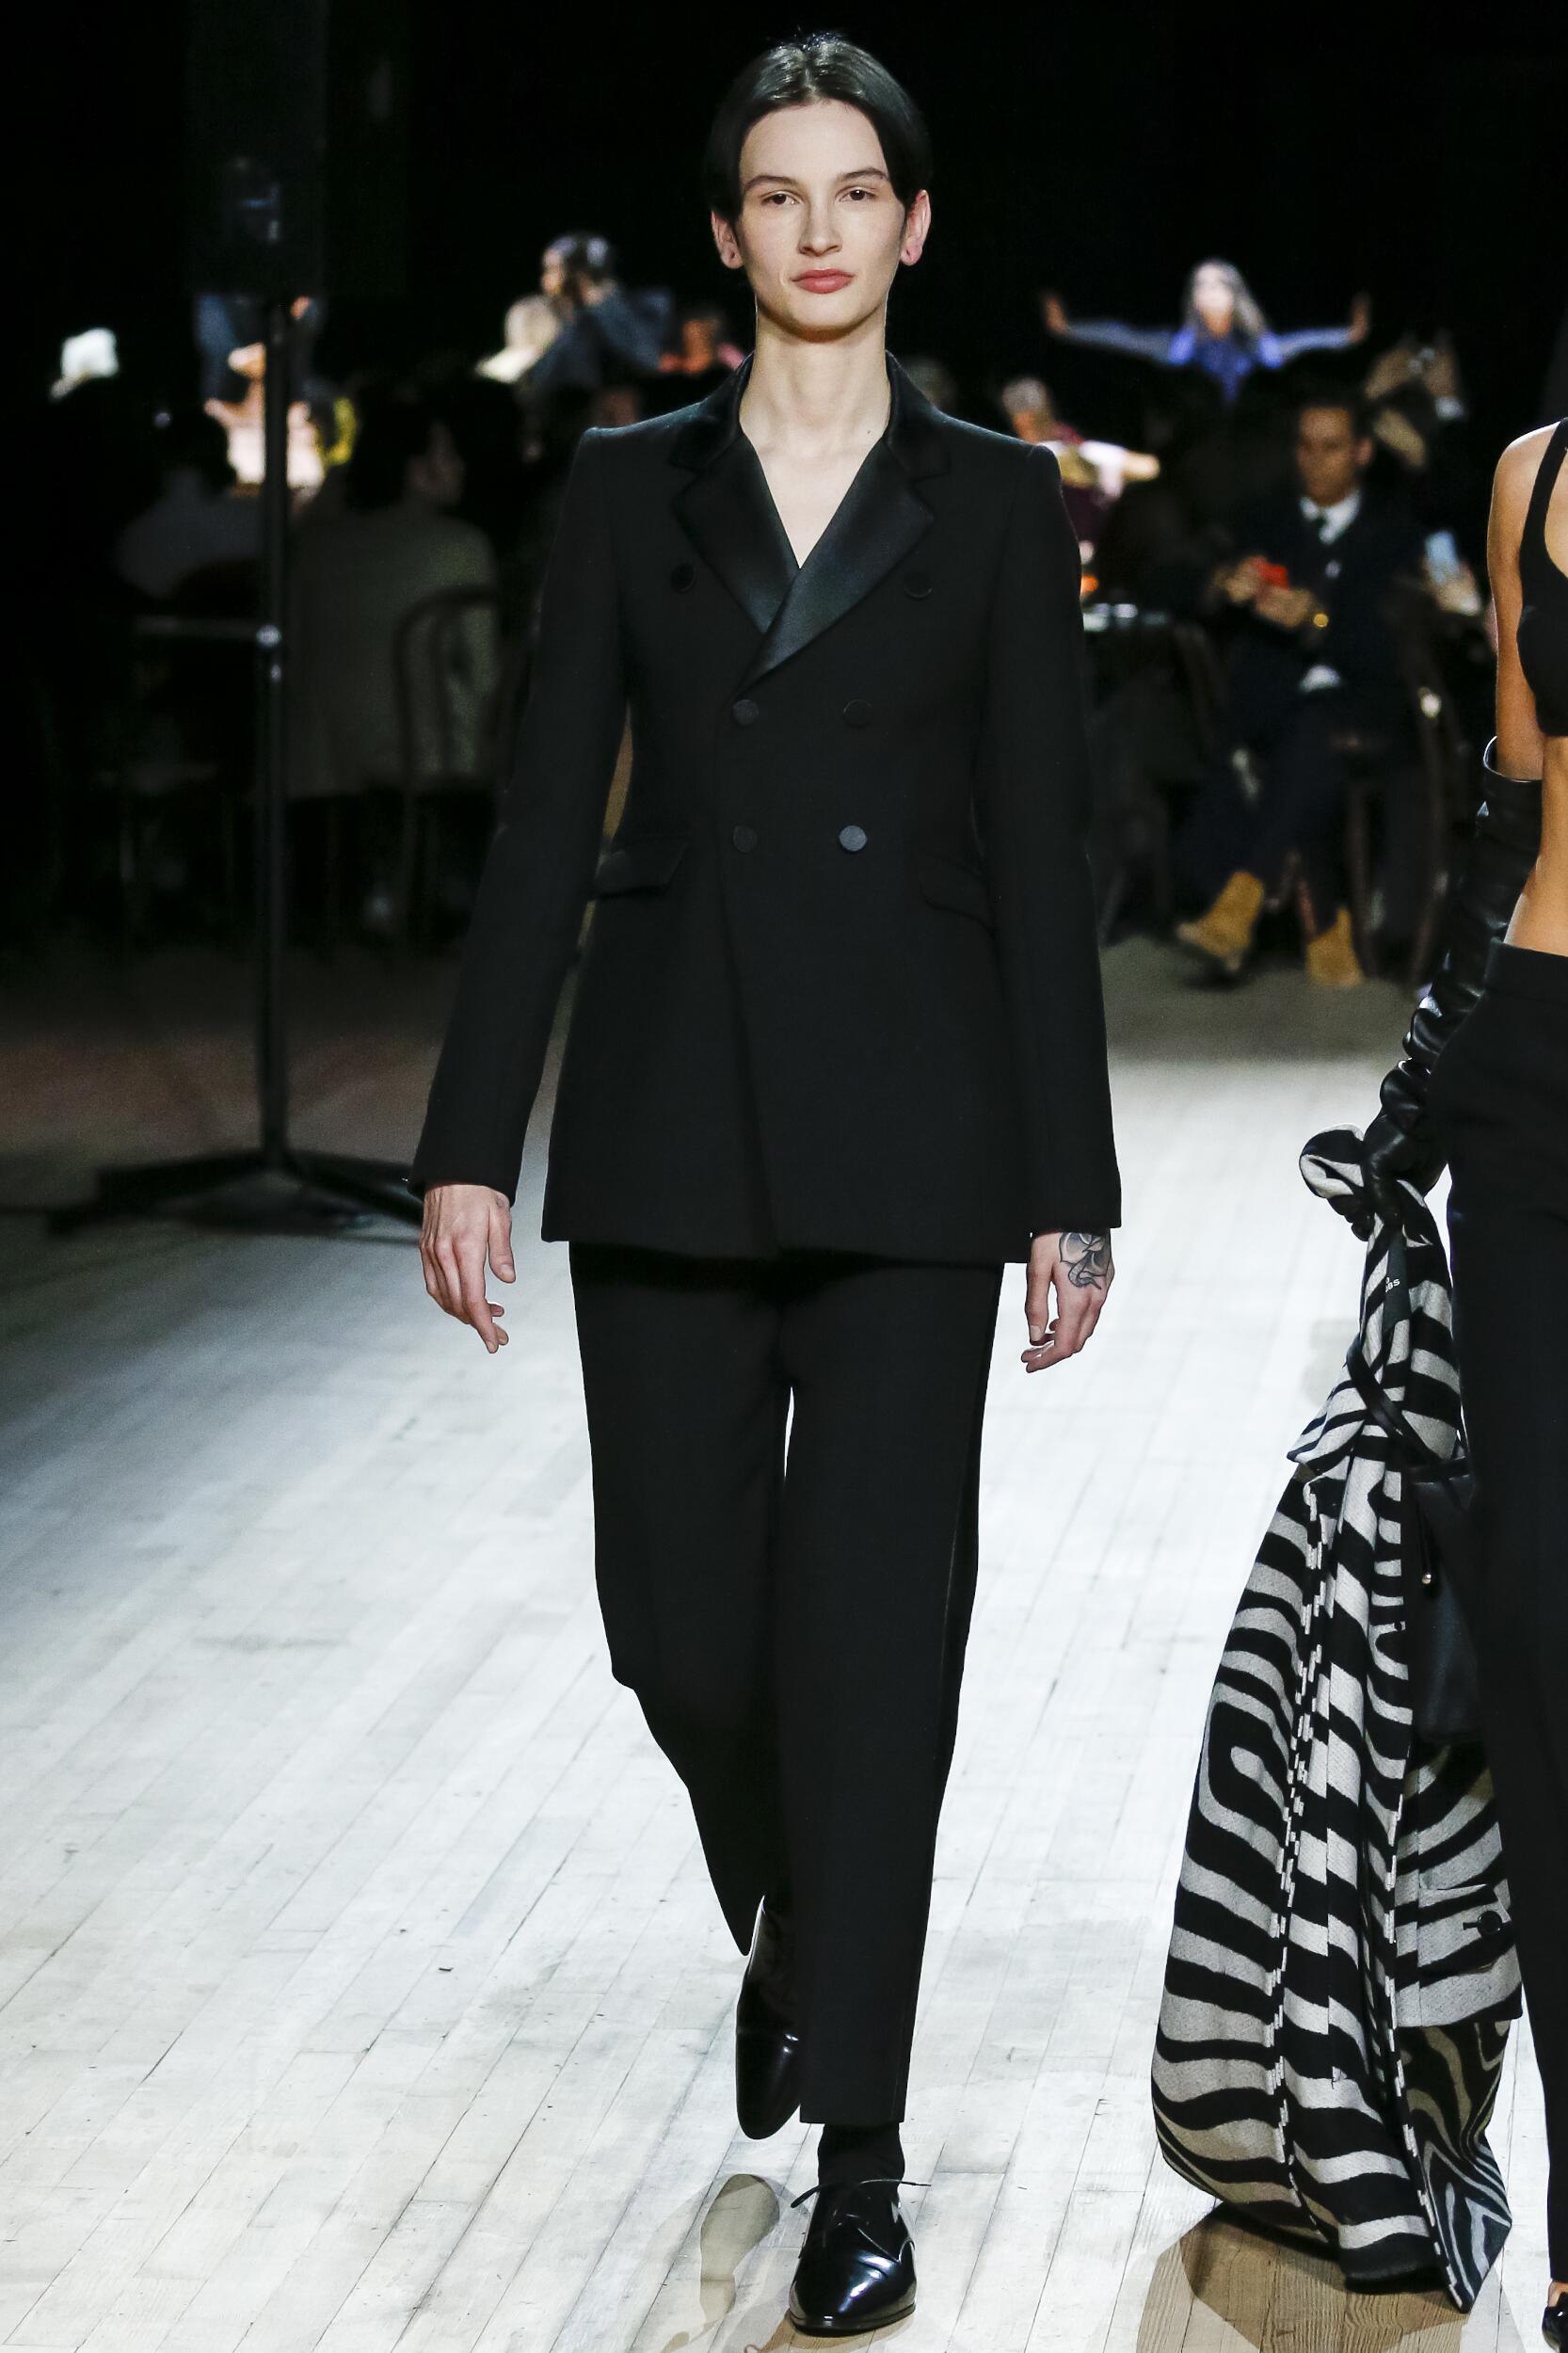 Woman Fashion 2020 Womens Style Marc Jacobs